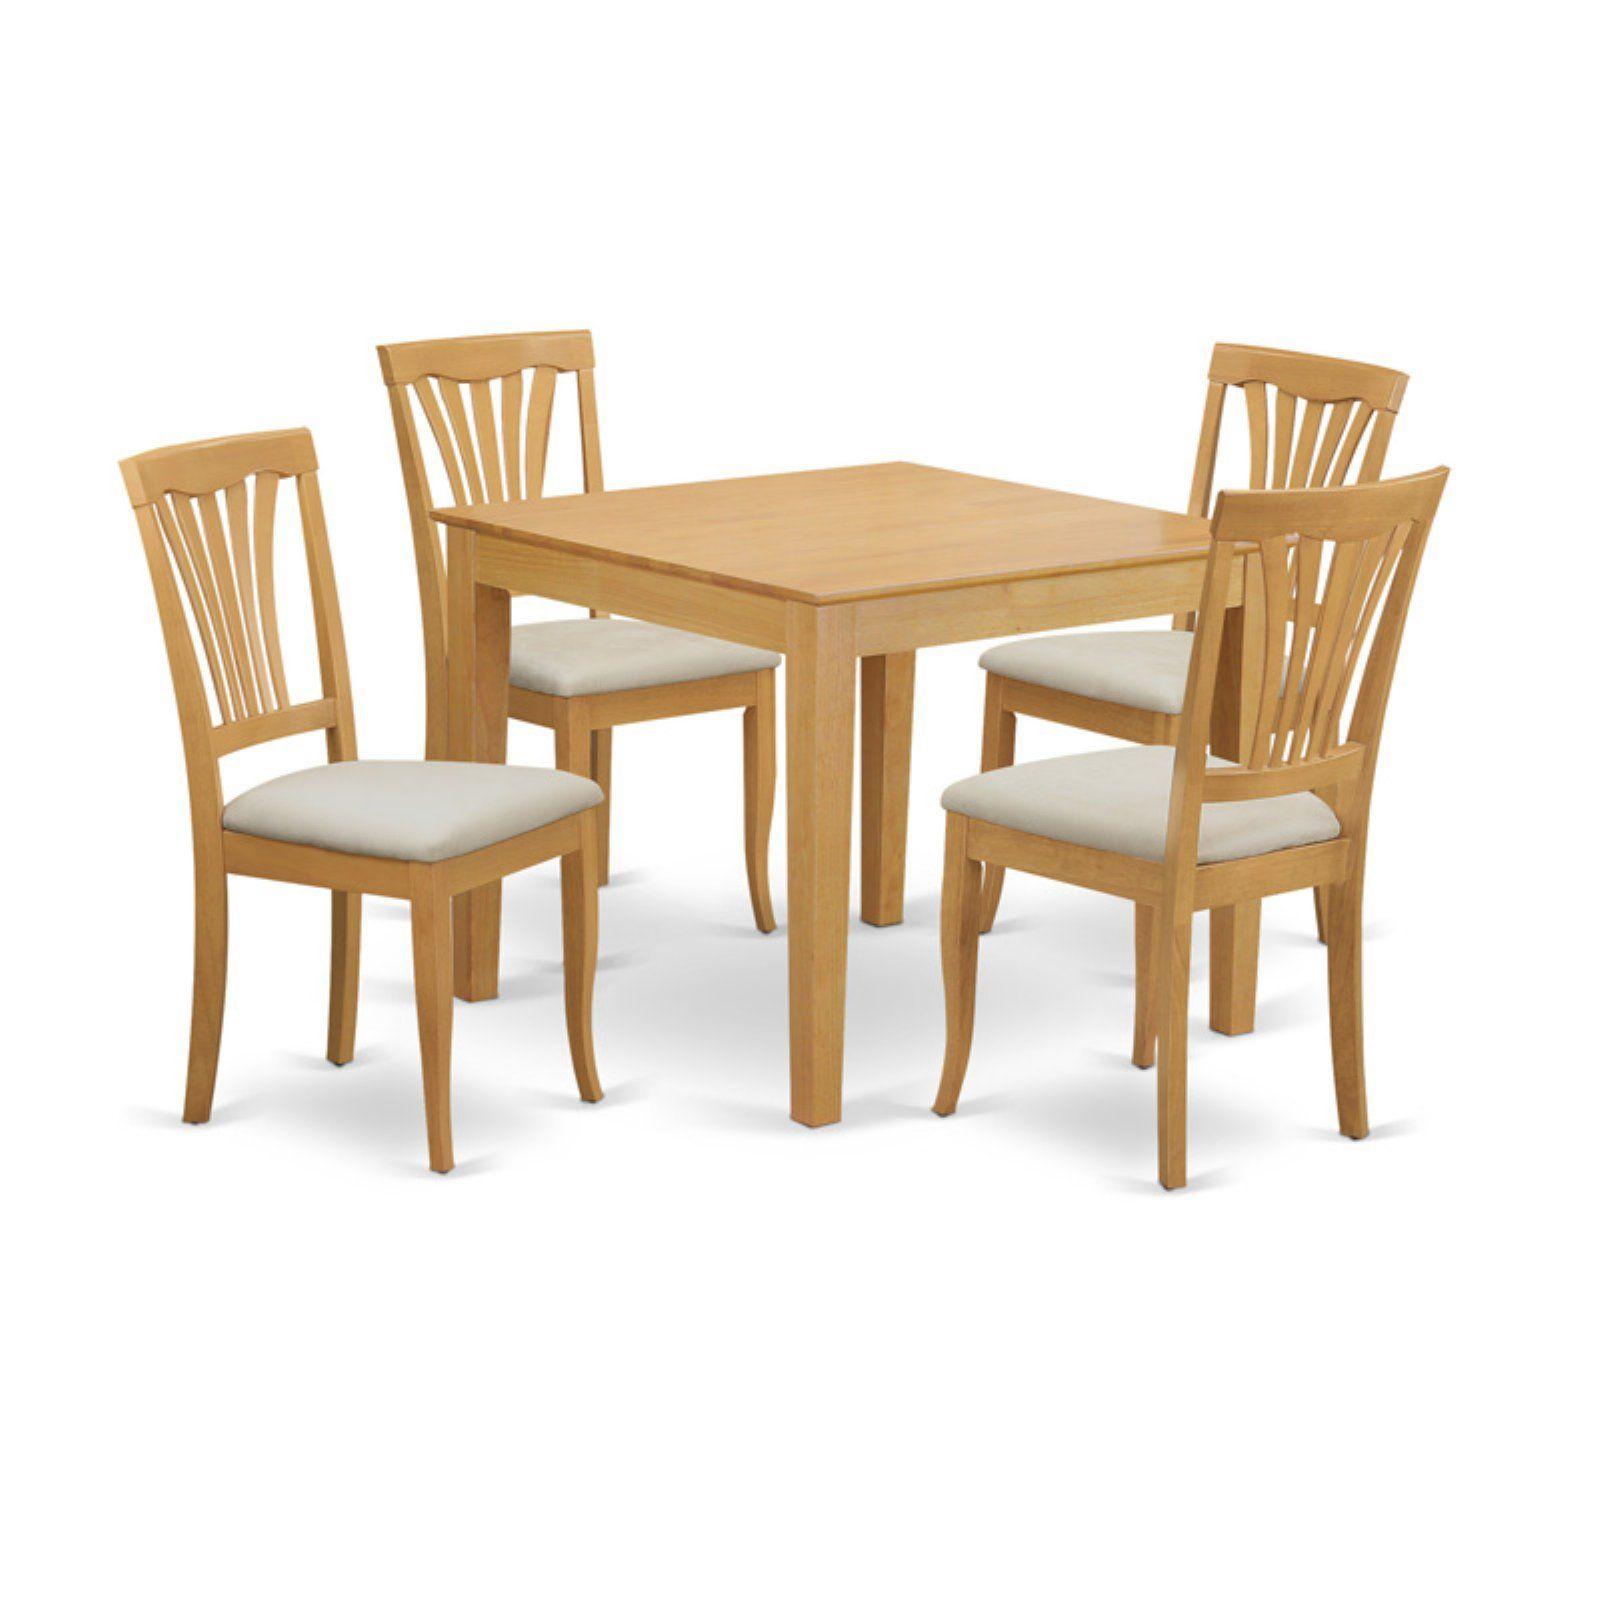 east west furniture 5 piece lath back breakfast nook dining table rh pinterest com